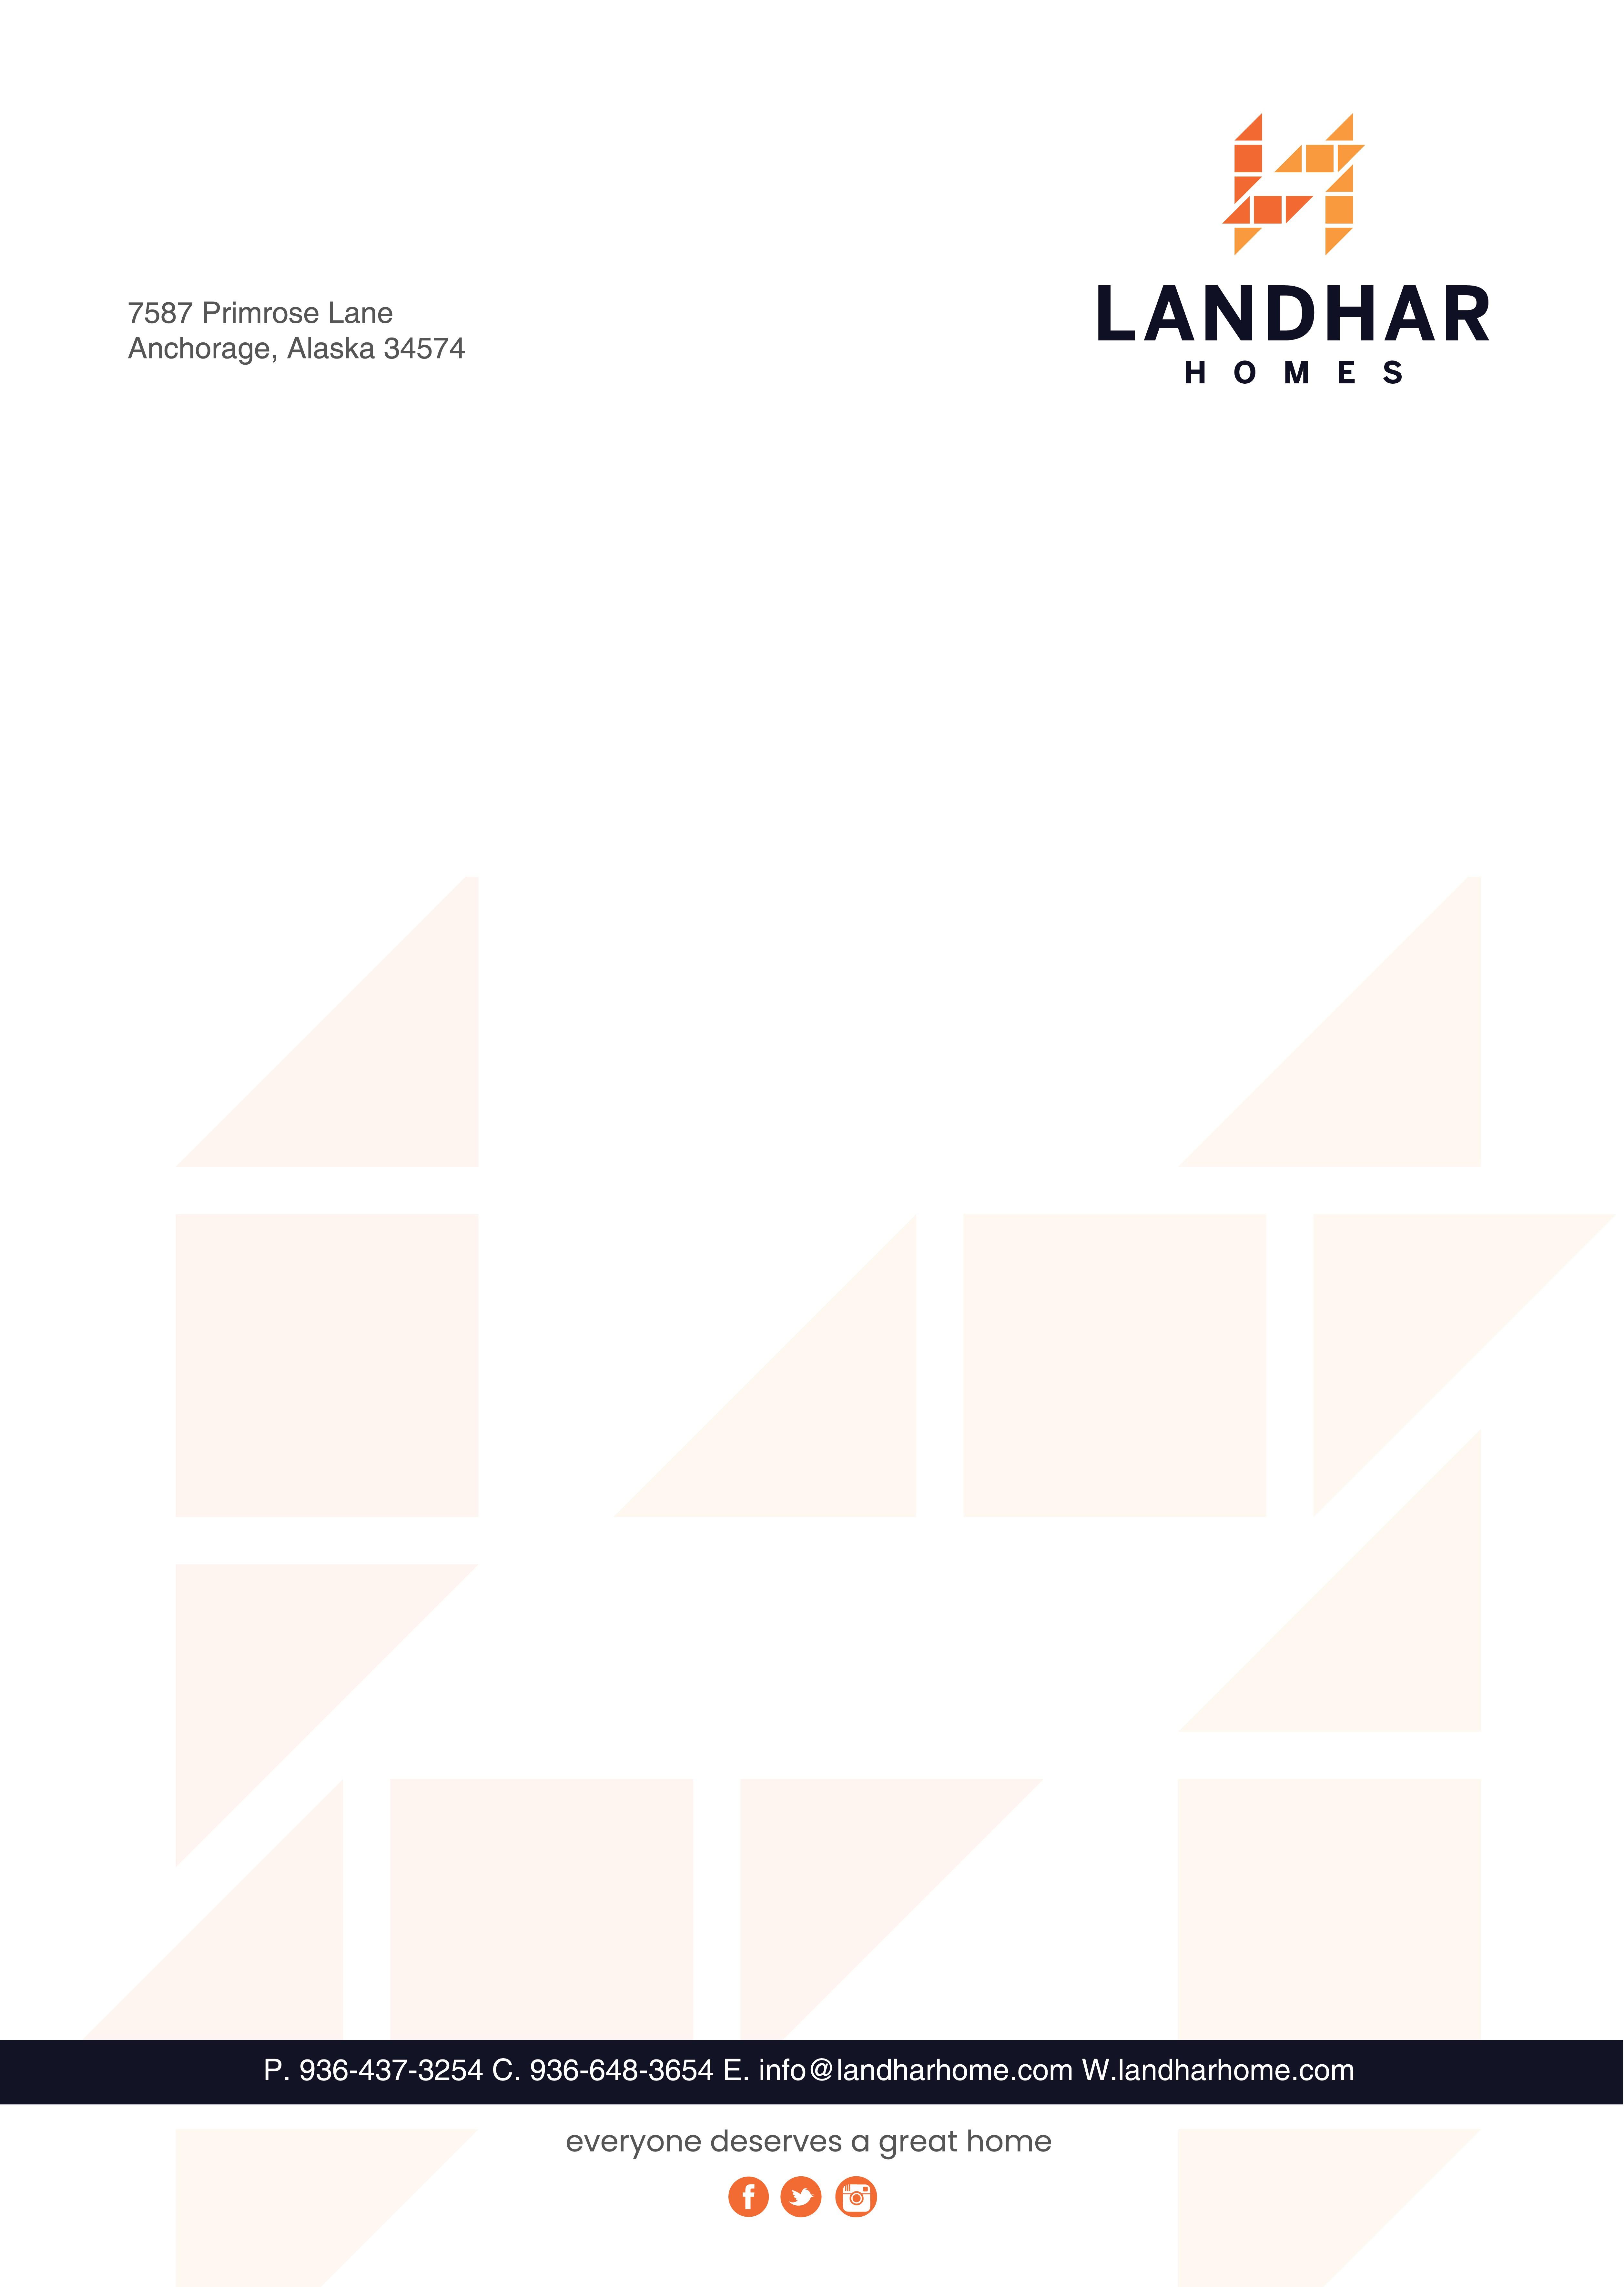 Letterhead and Document Portfolio for Home Builder